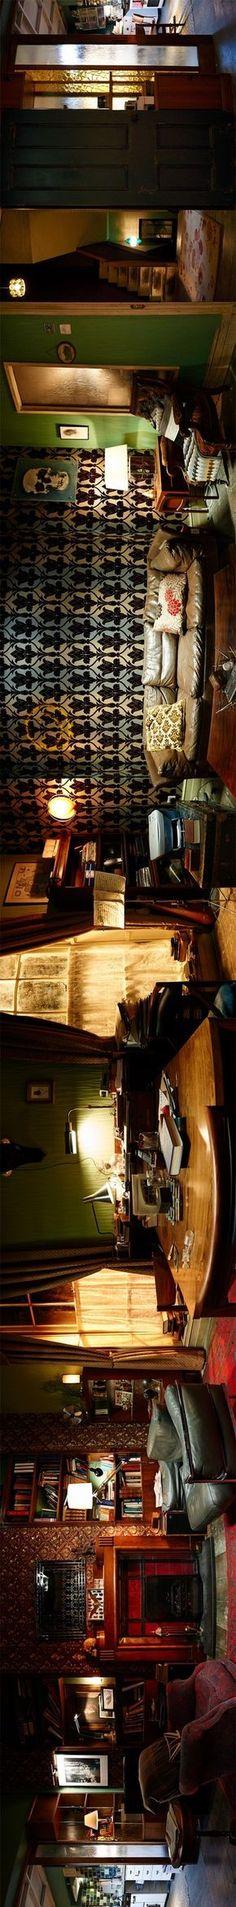 360° Panoramic Tour Around 221B Baker Street